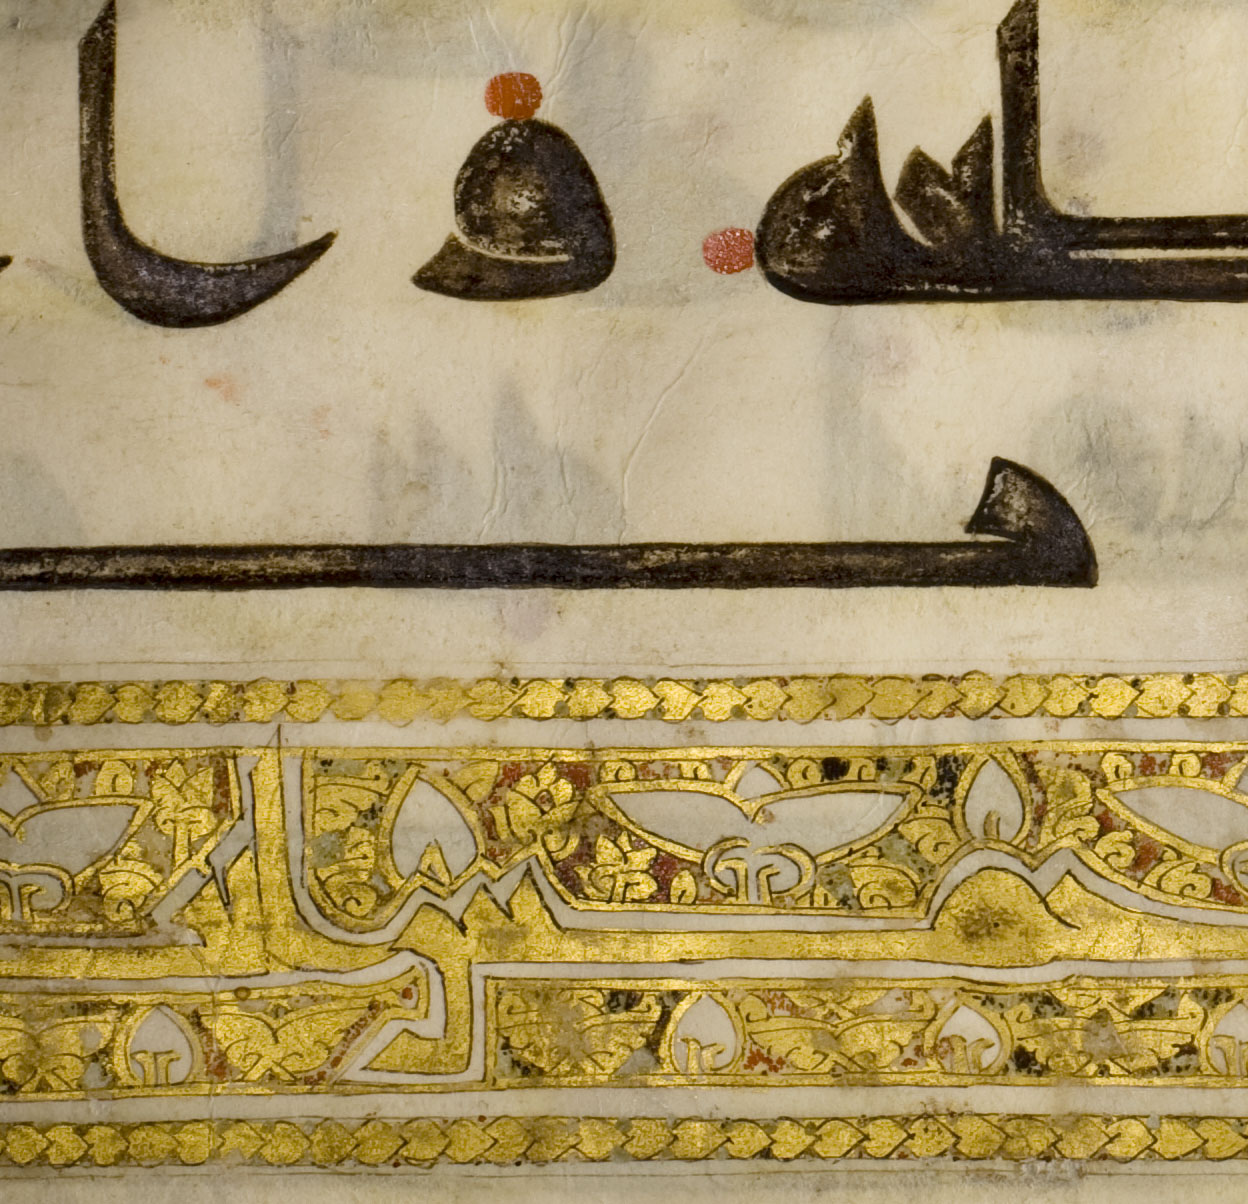 An Illuminated Kufic Qur'an folio (detail)